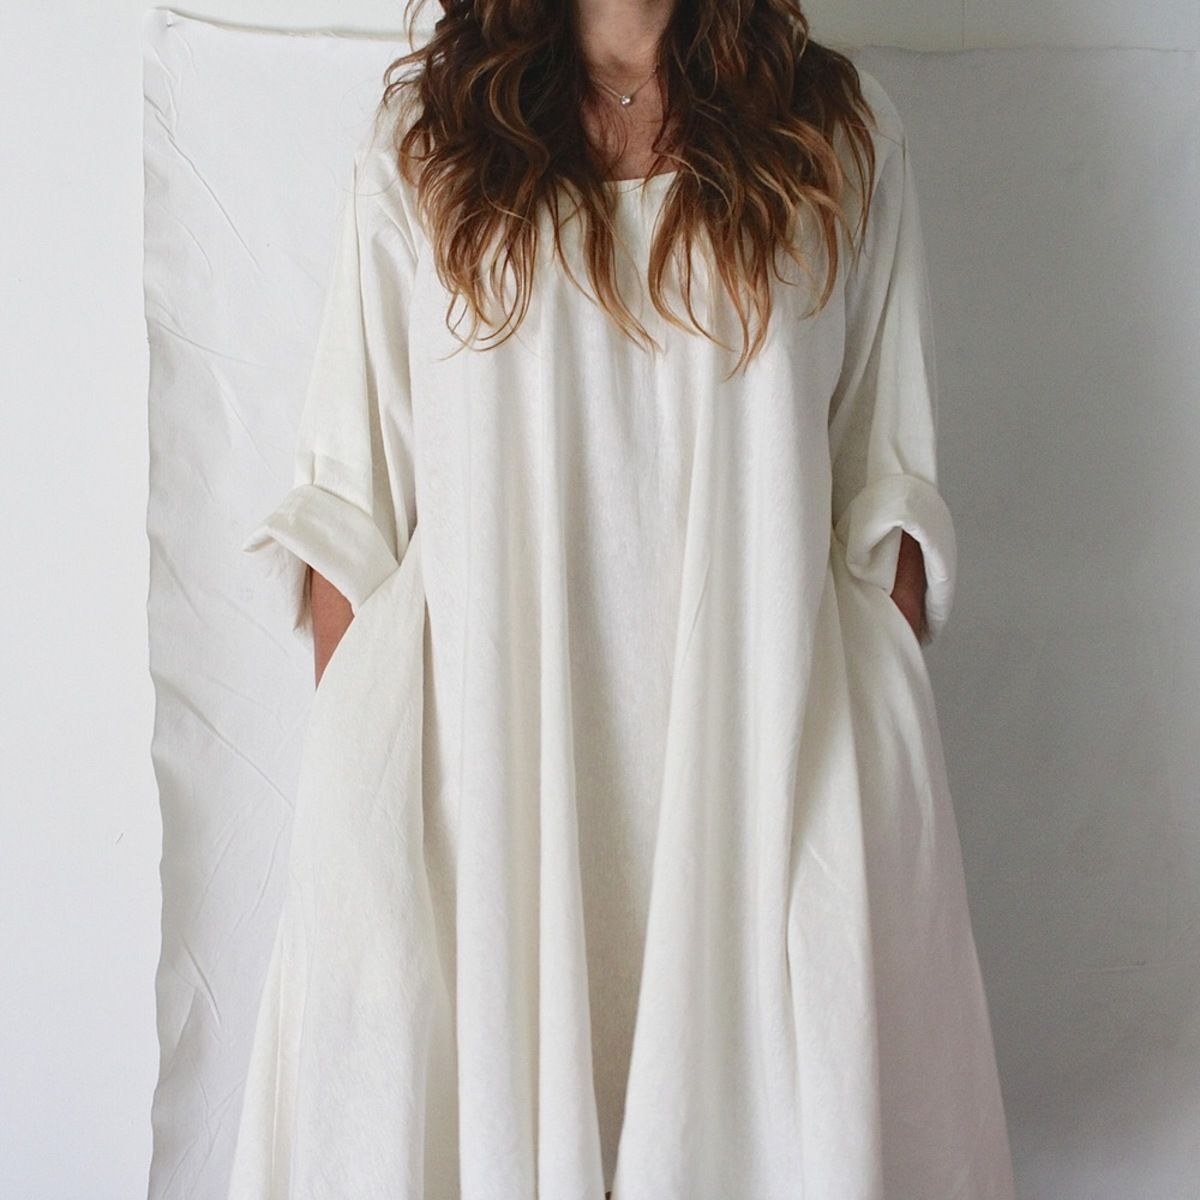 Hemp Silk Twirl Dress, Natural on Garmentory | Hemp fashion, Twirl dress,  Dresses